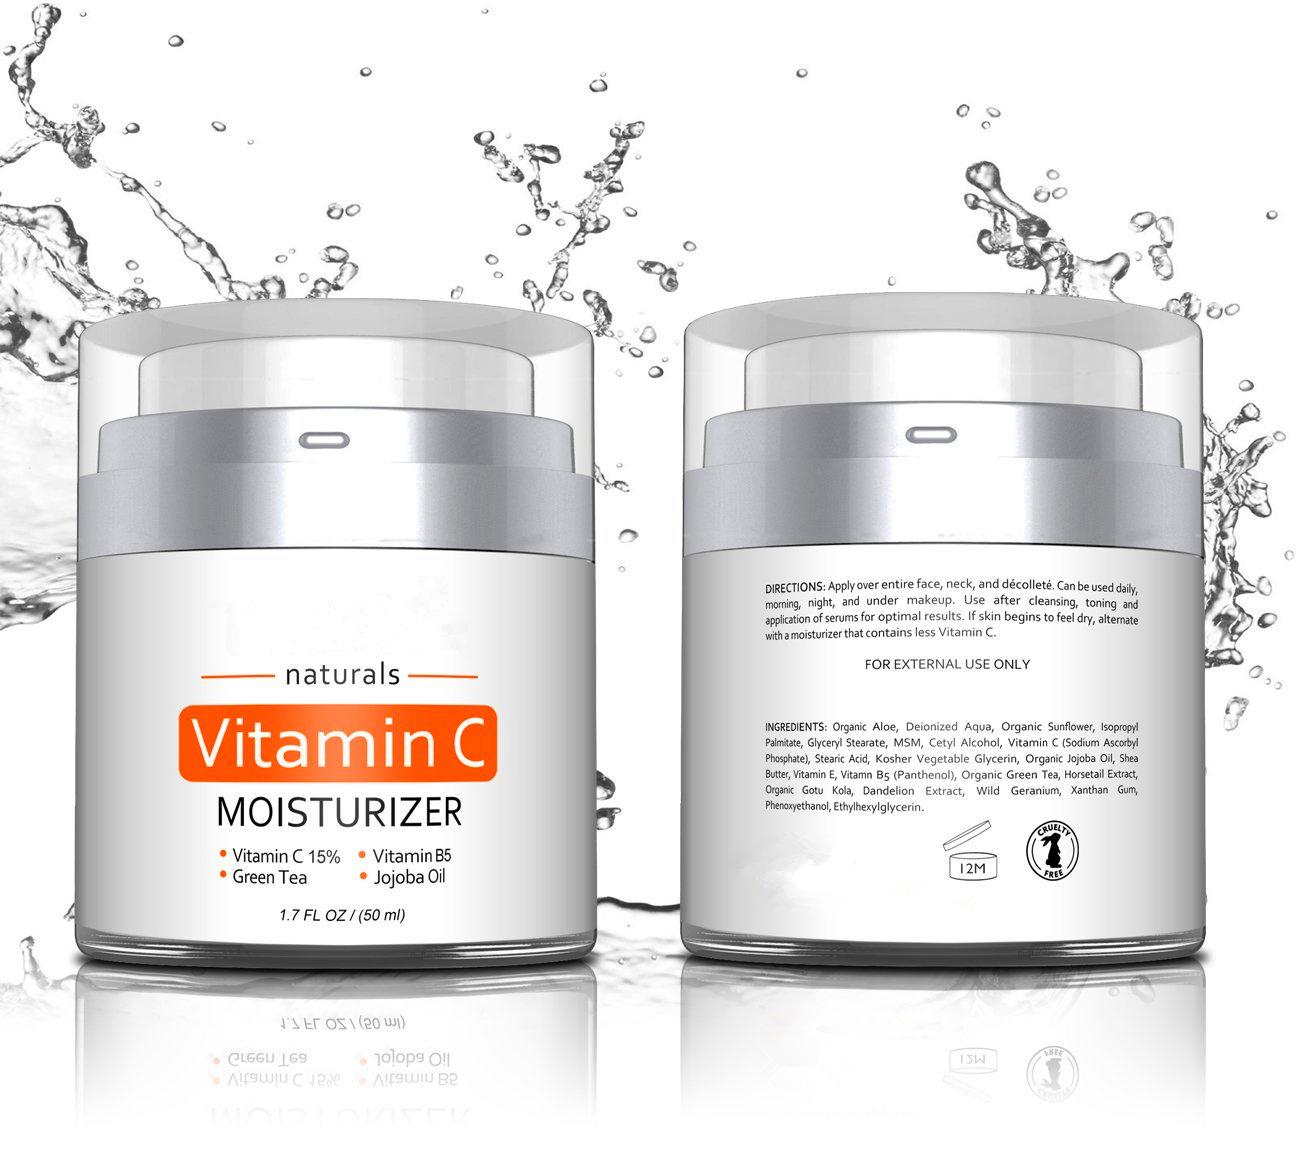 Oem/odm Anti-aging Whitening Vitamin C Moisturizer Face Cream - Buy  Whitening Cream,Vitamin C Lightening Cream,Ace Cream Product on Alibaba com